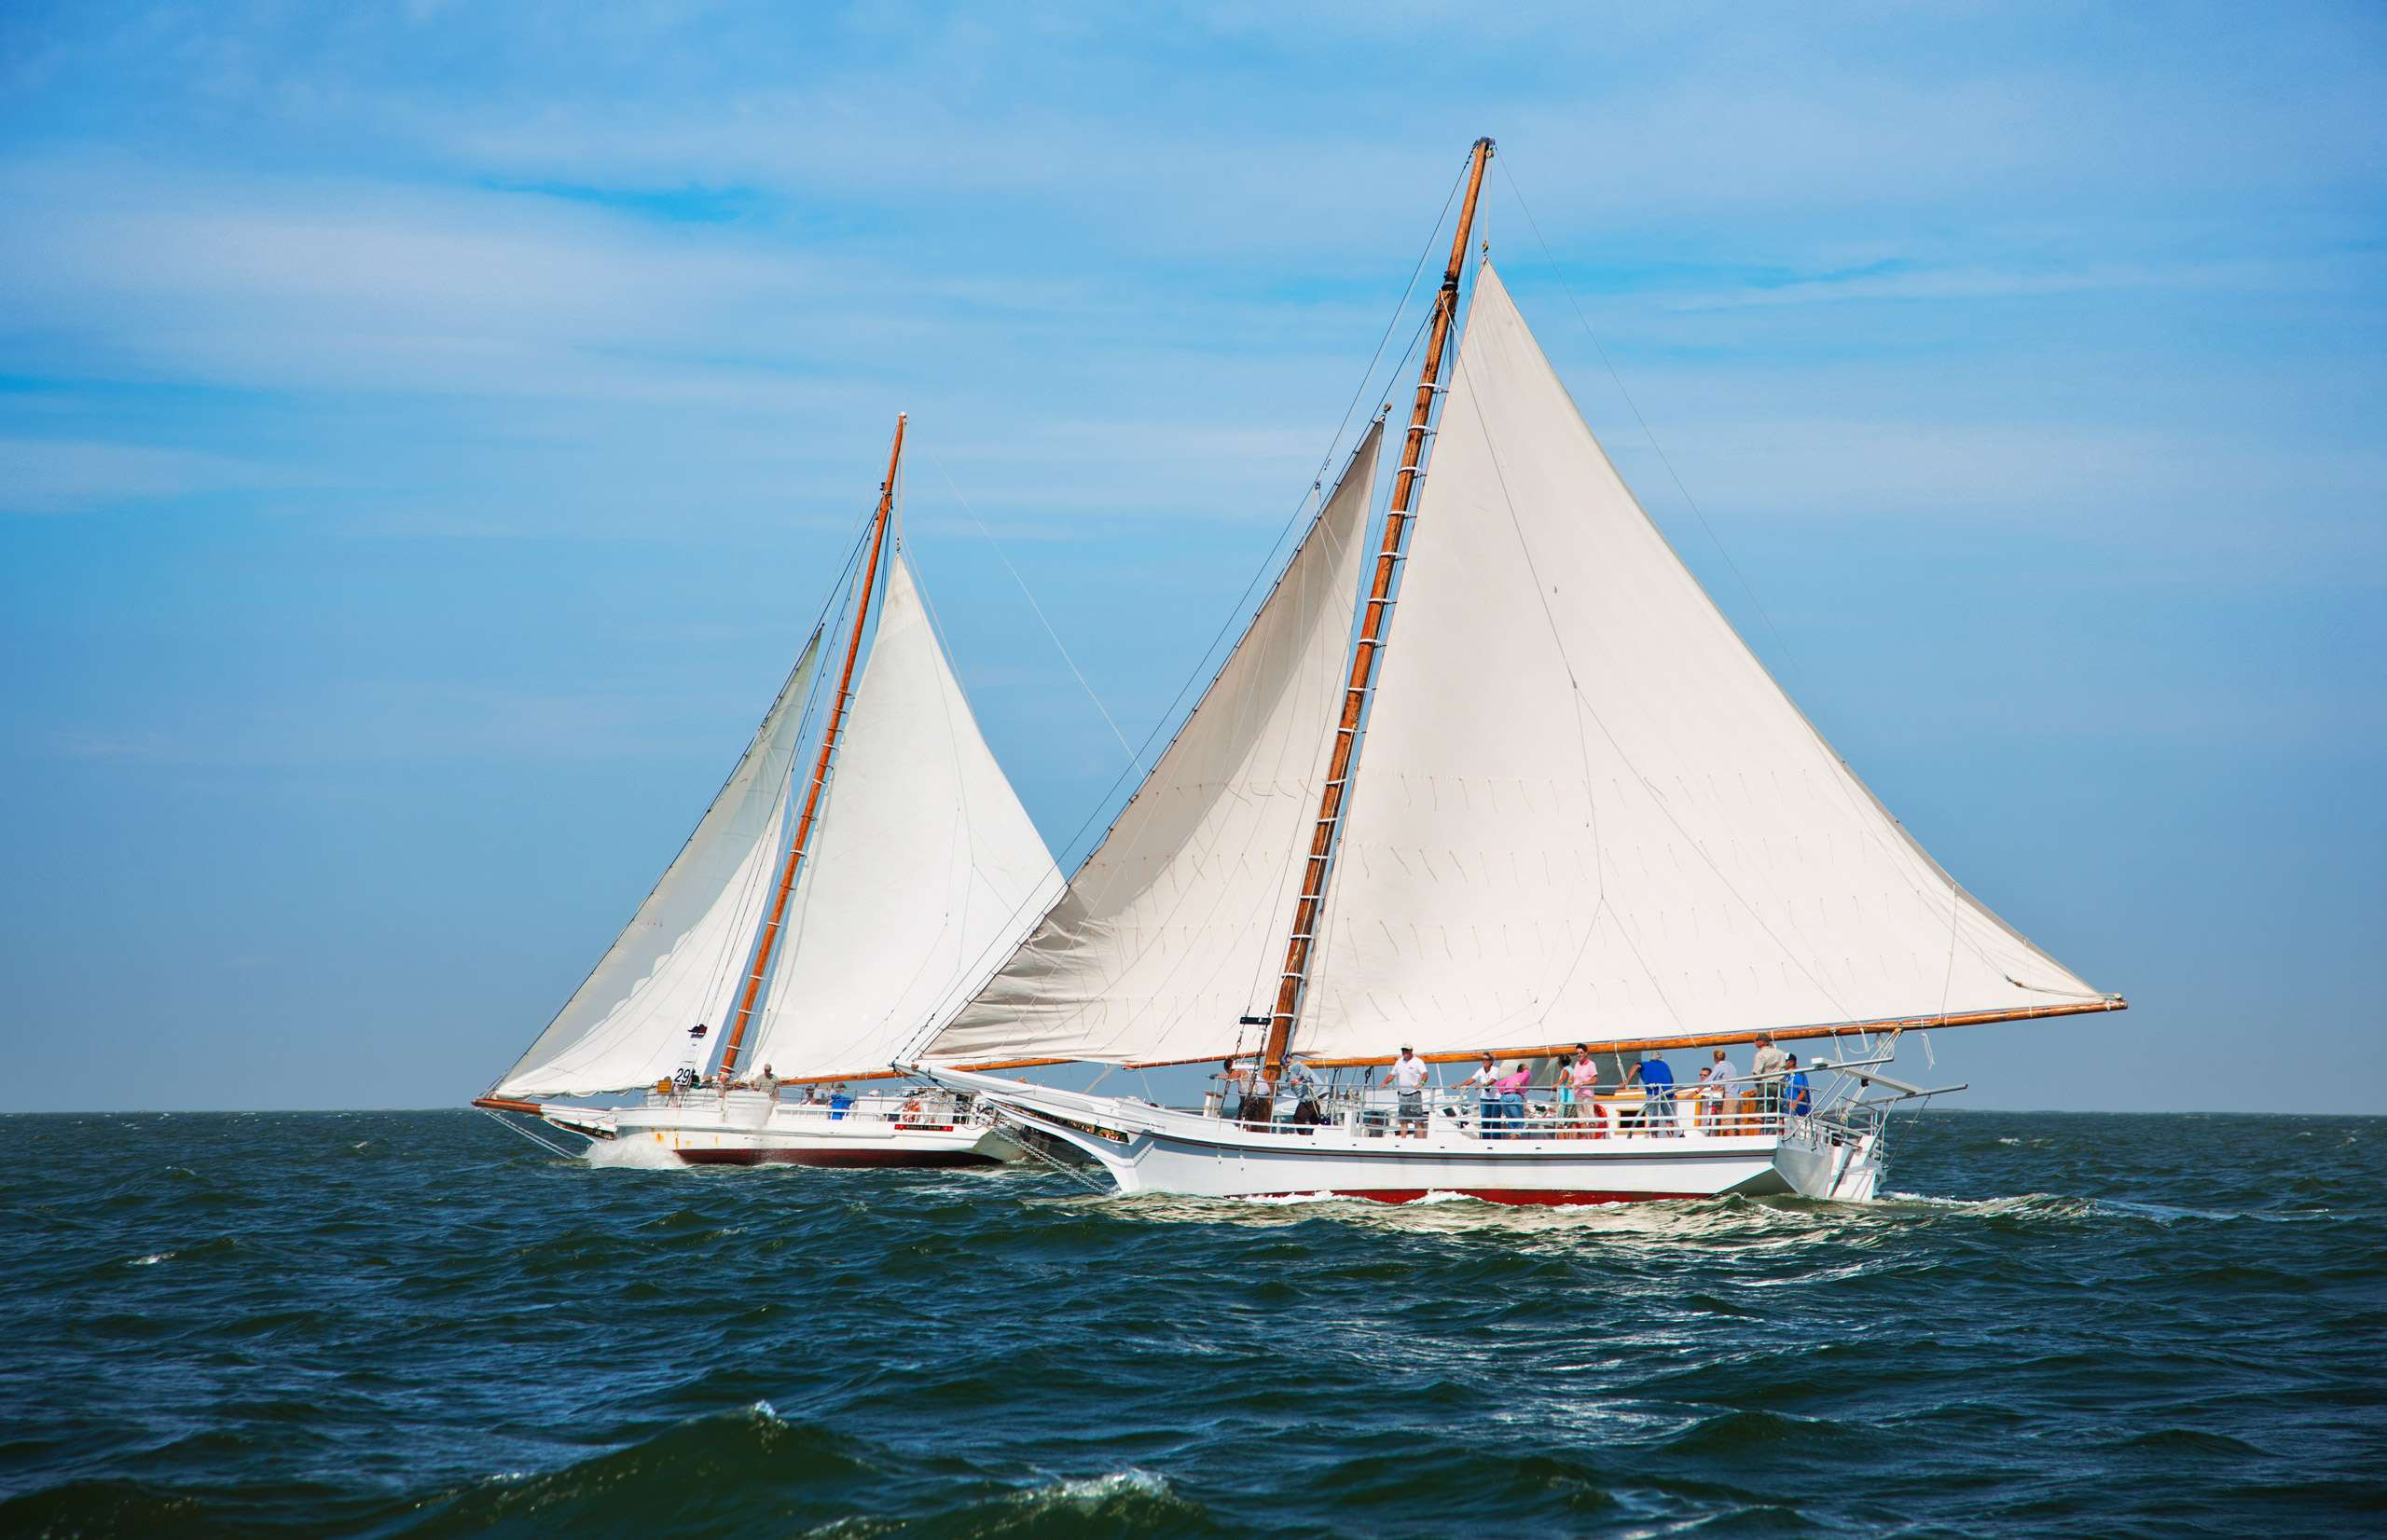 PORTFOLIO - Sailing - Skipjacks #17